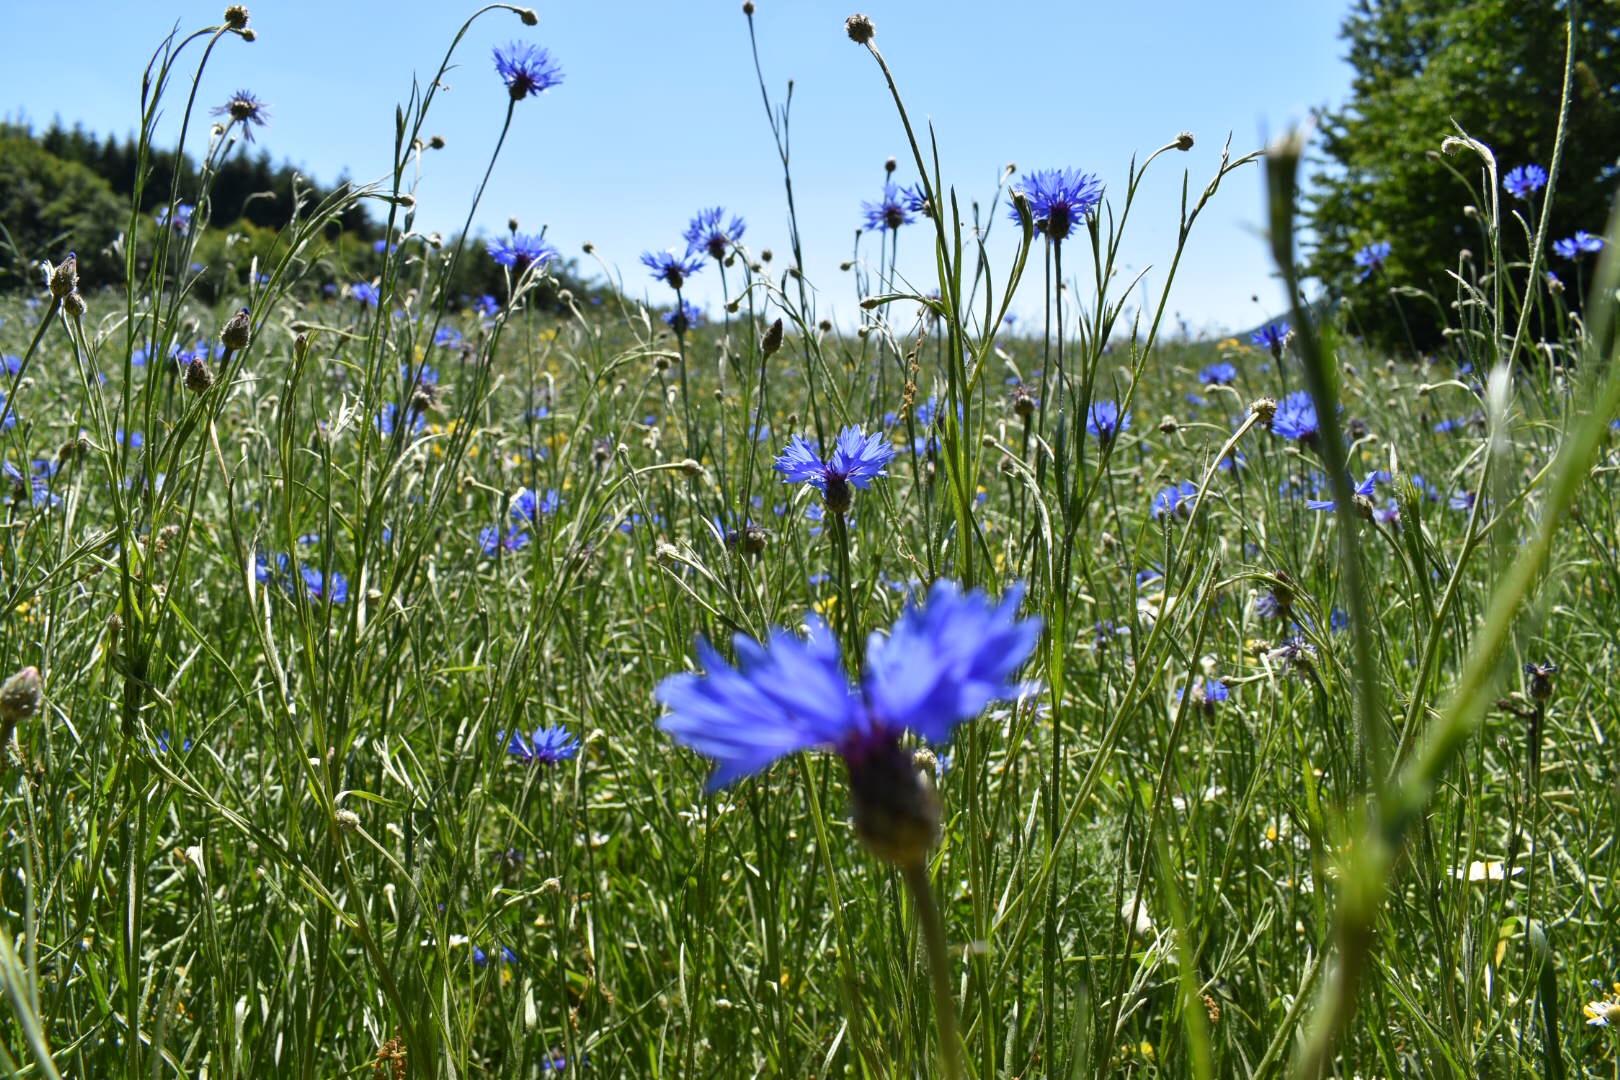 Blaue Kornblumen im Feld